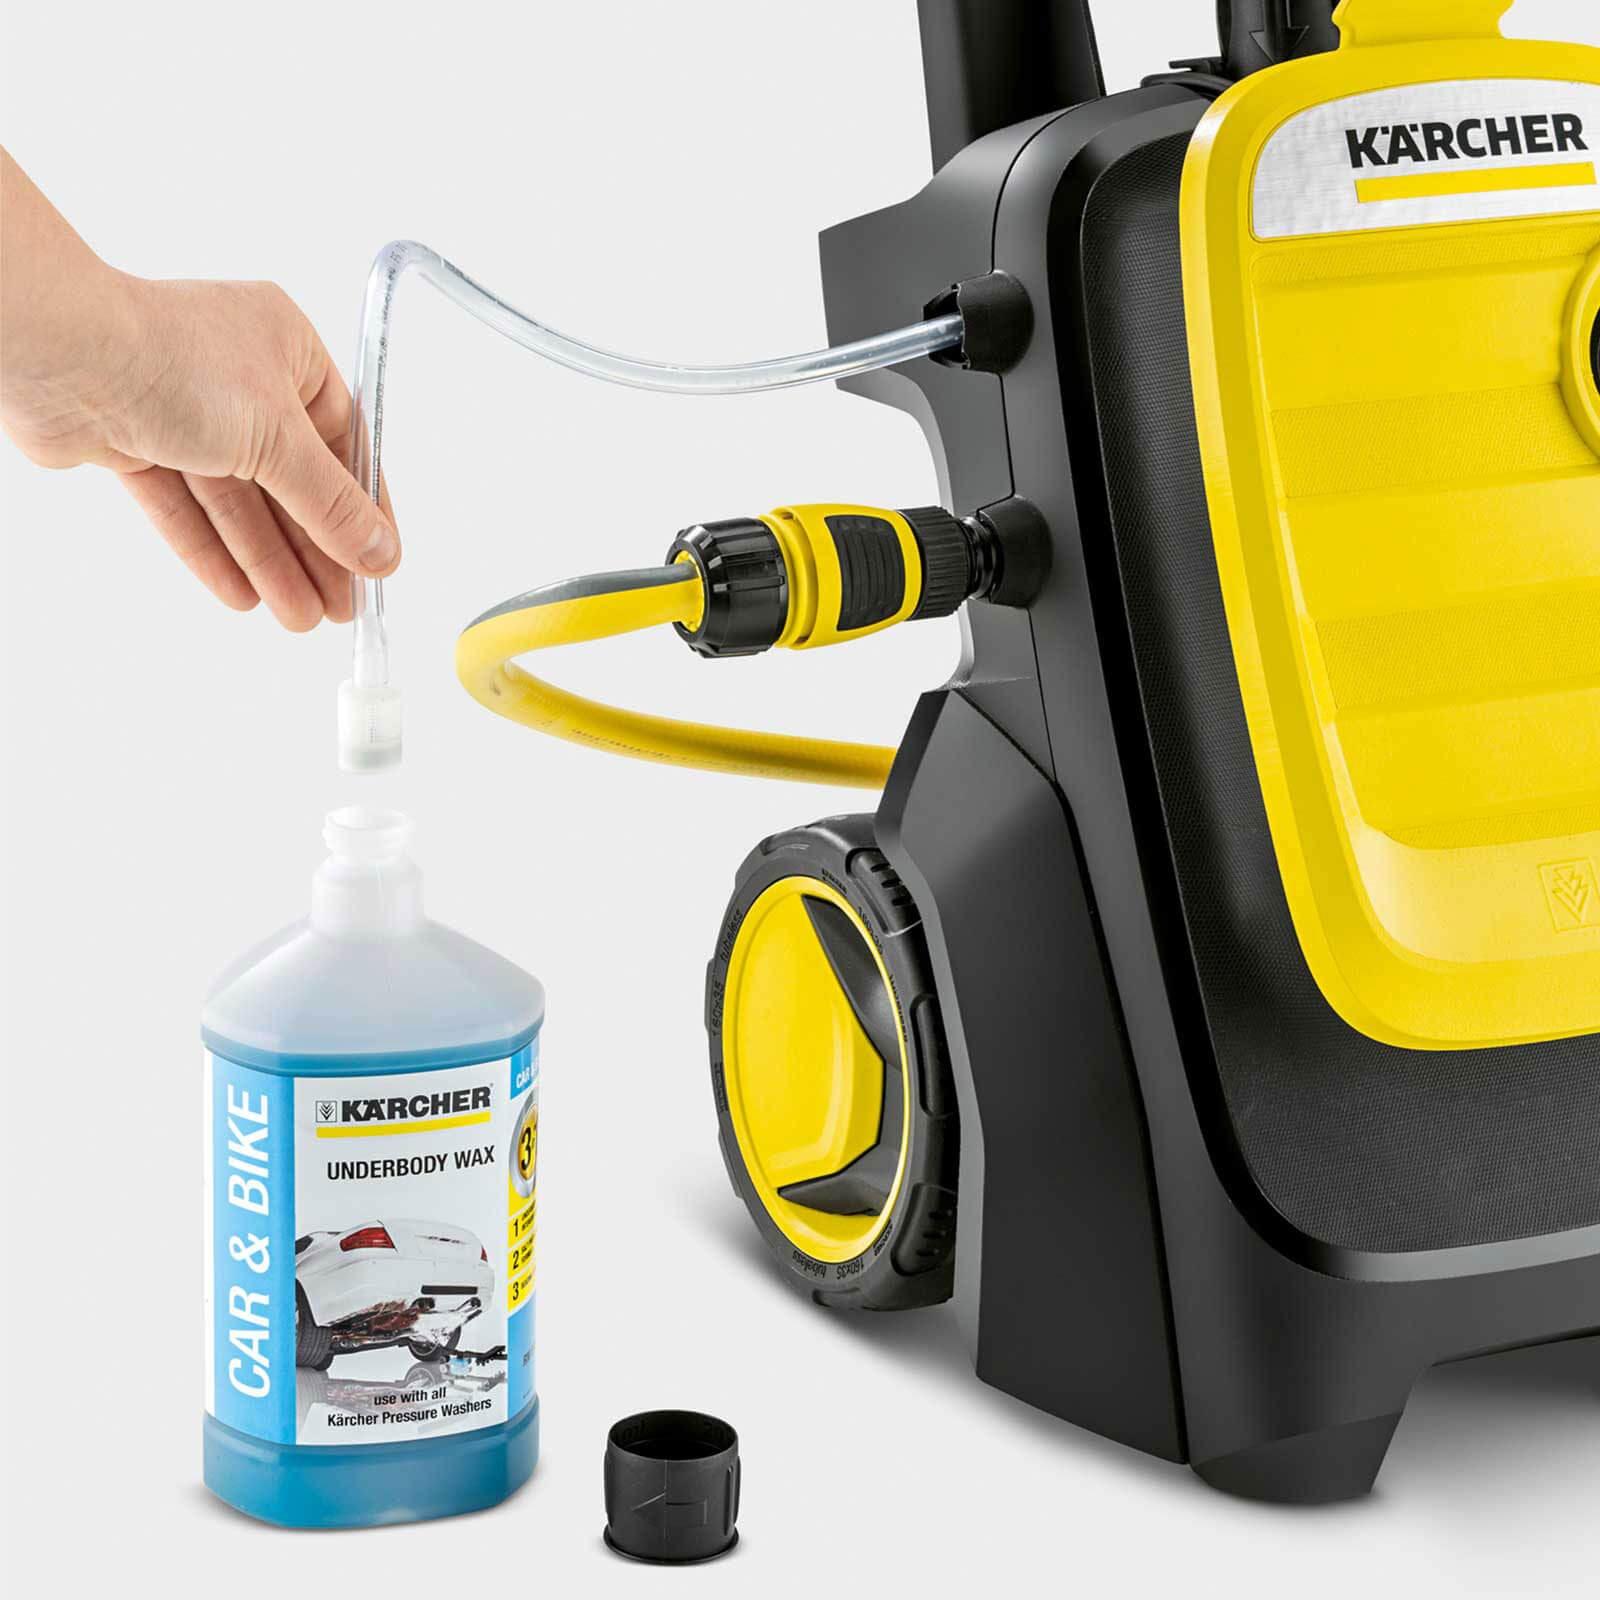 Karcher K5 COMPACT Pressure Washer 145 Bar New 2019 Model